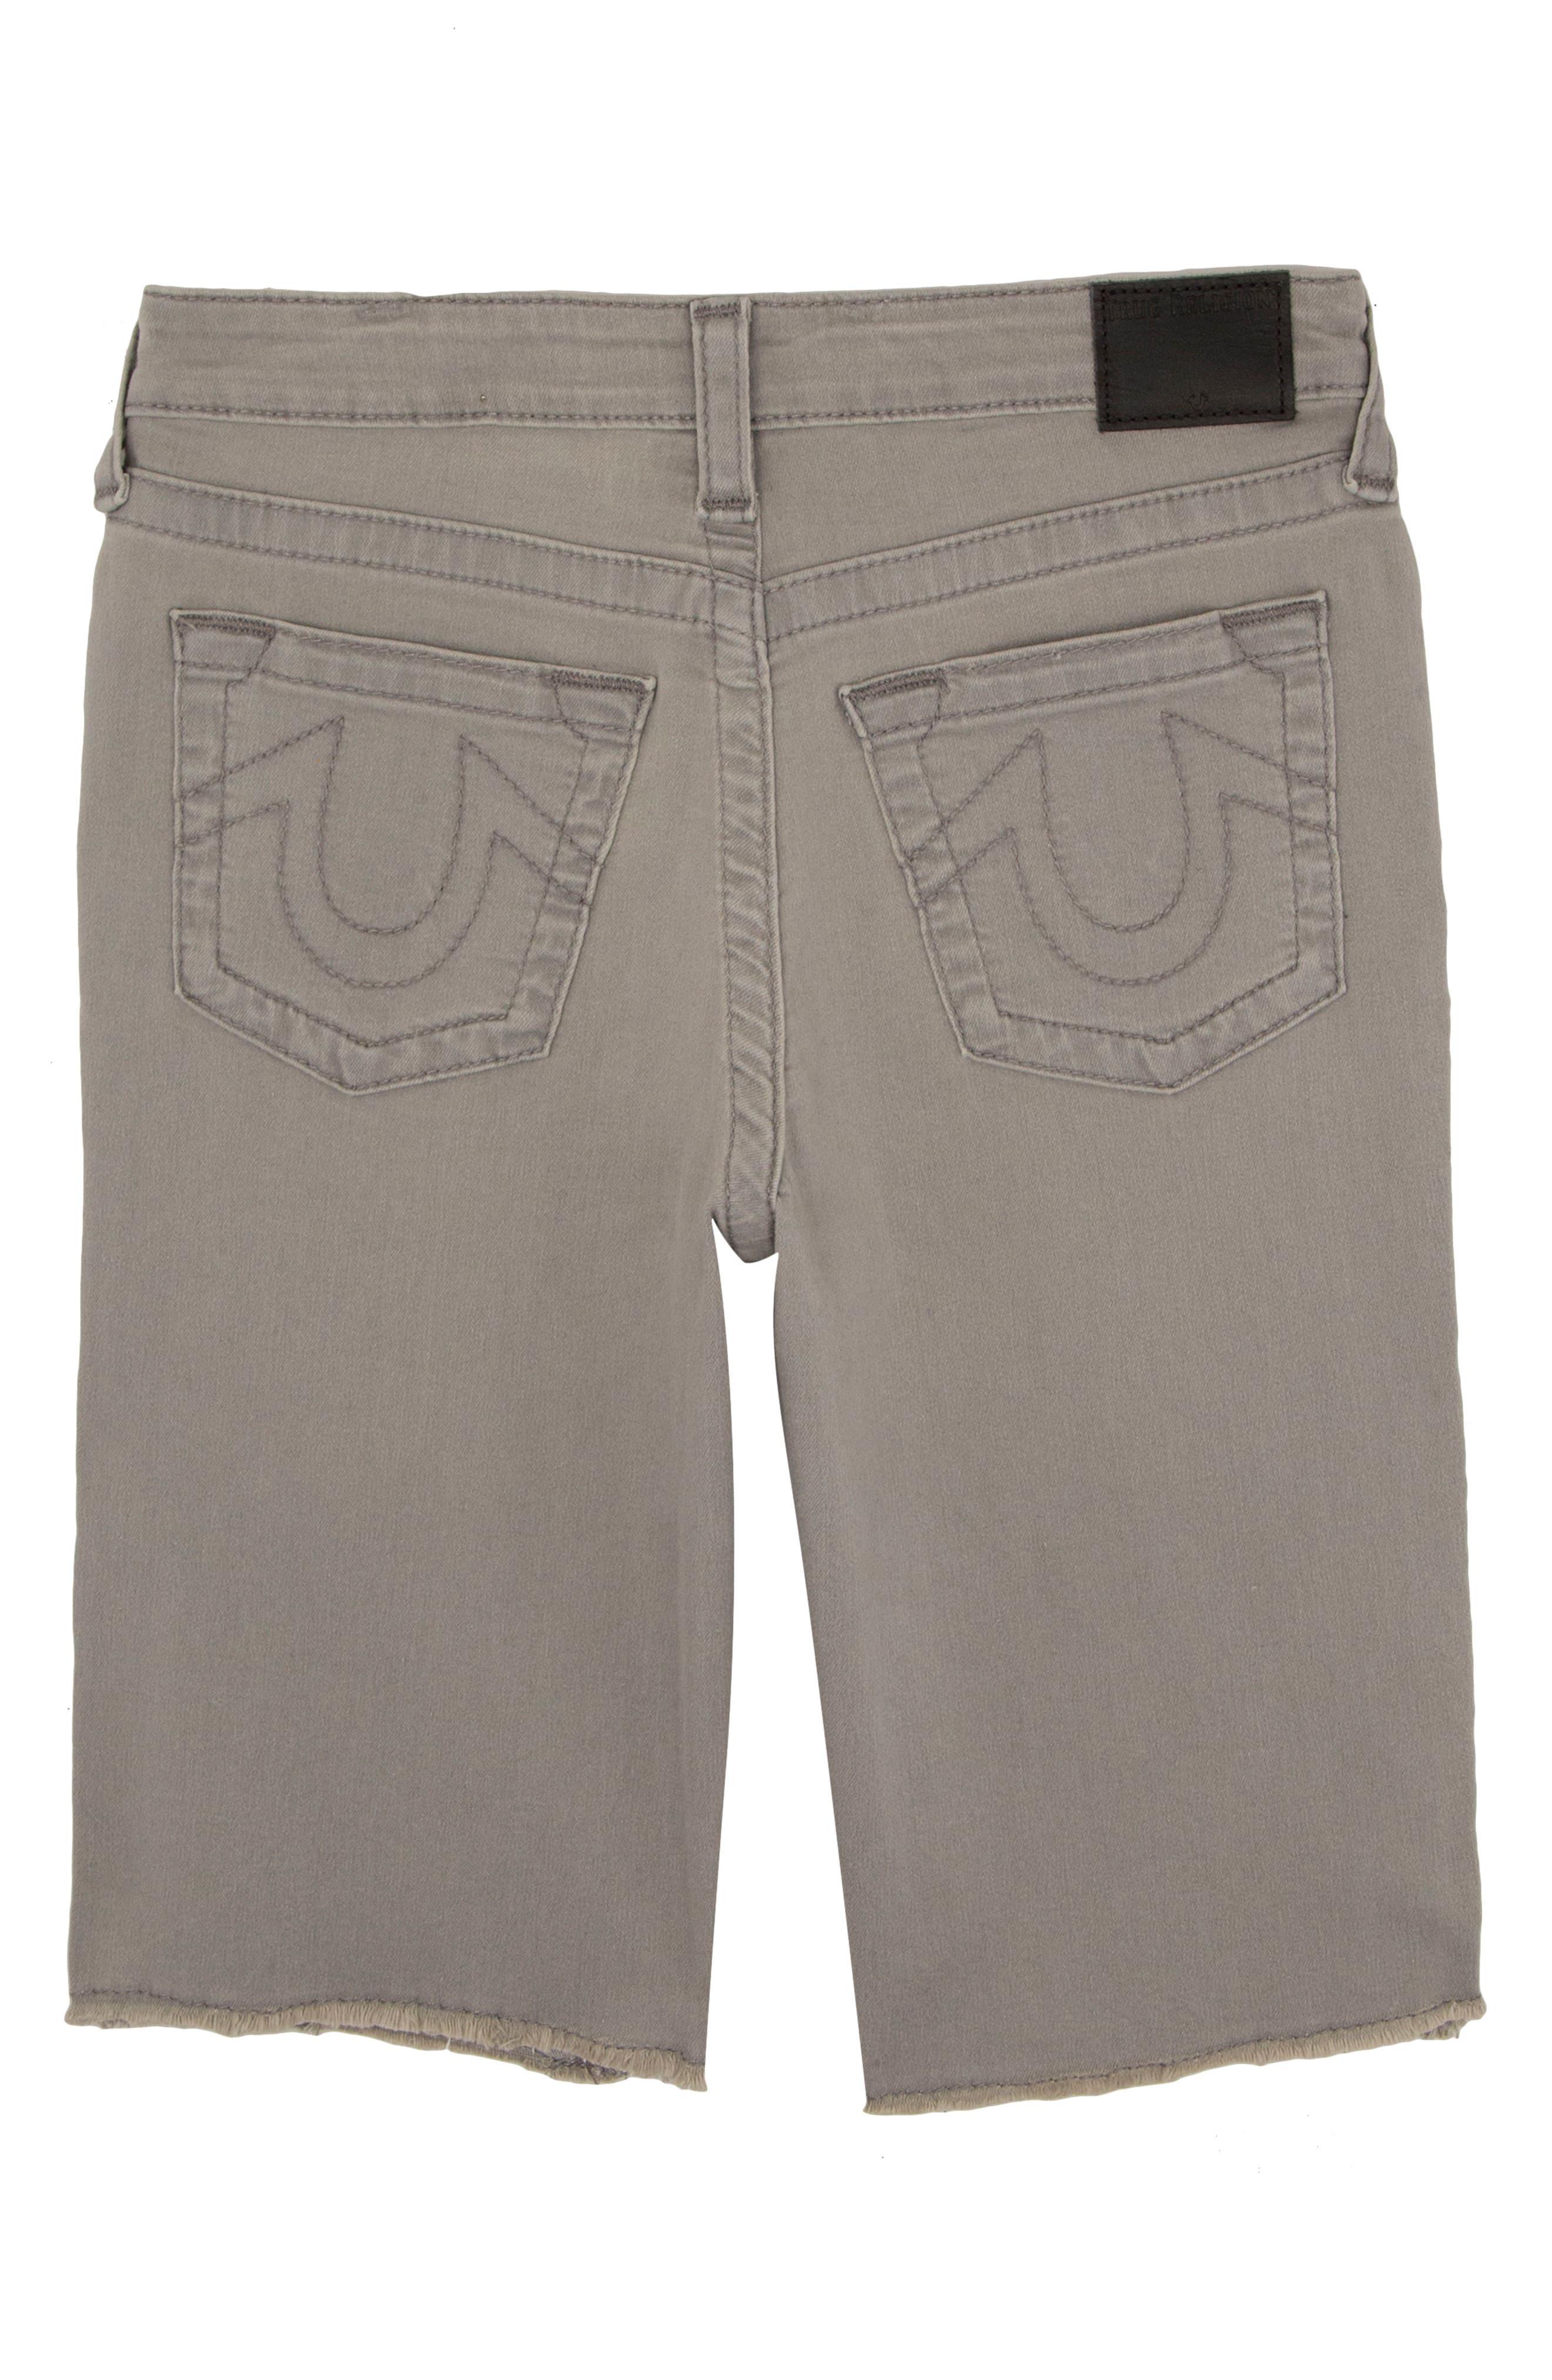 Geno Shorts,                             Alternate thumbnail 2, color,                             099